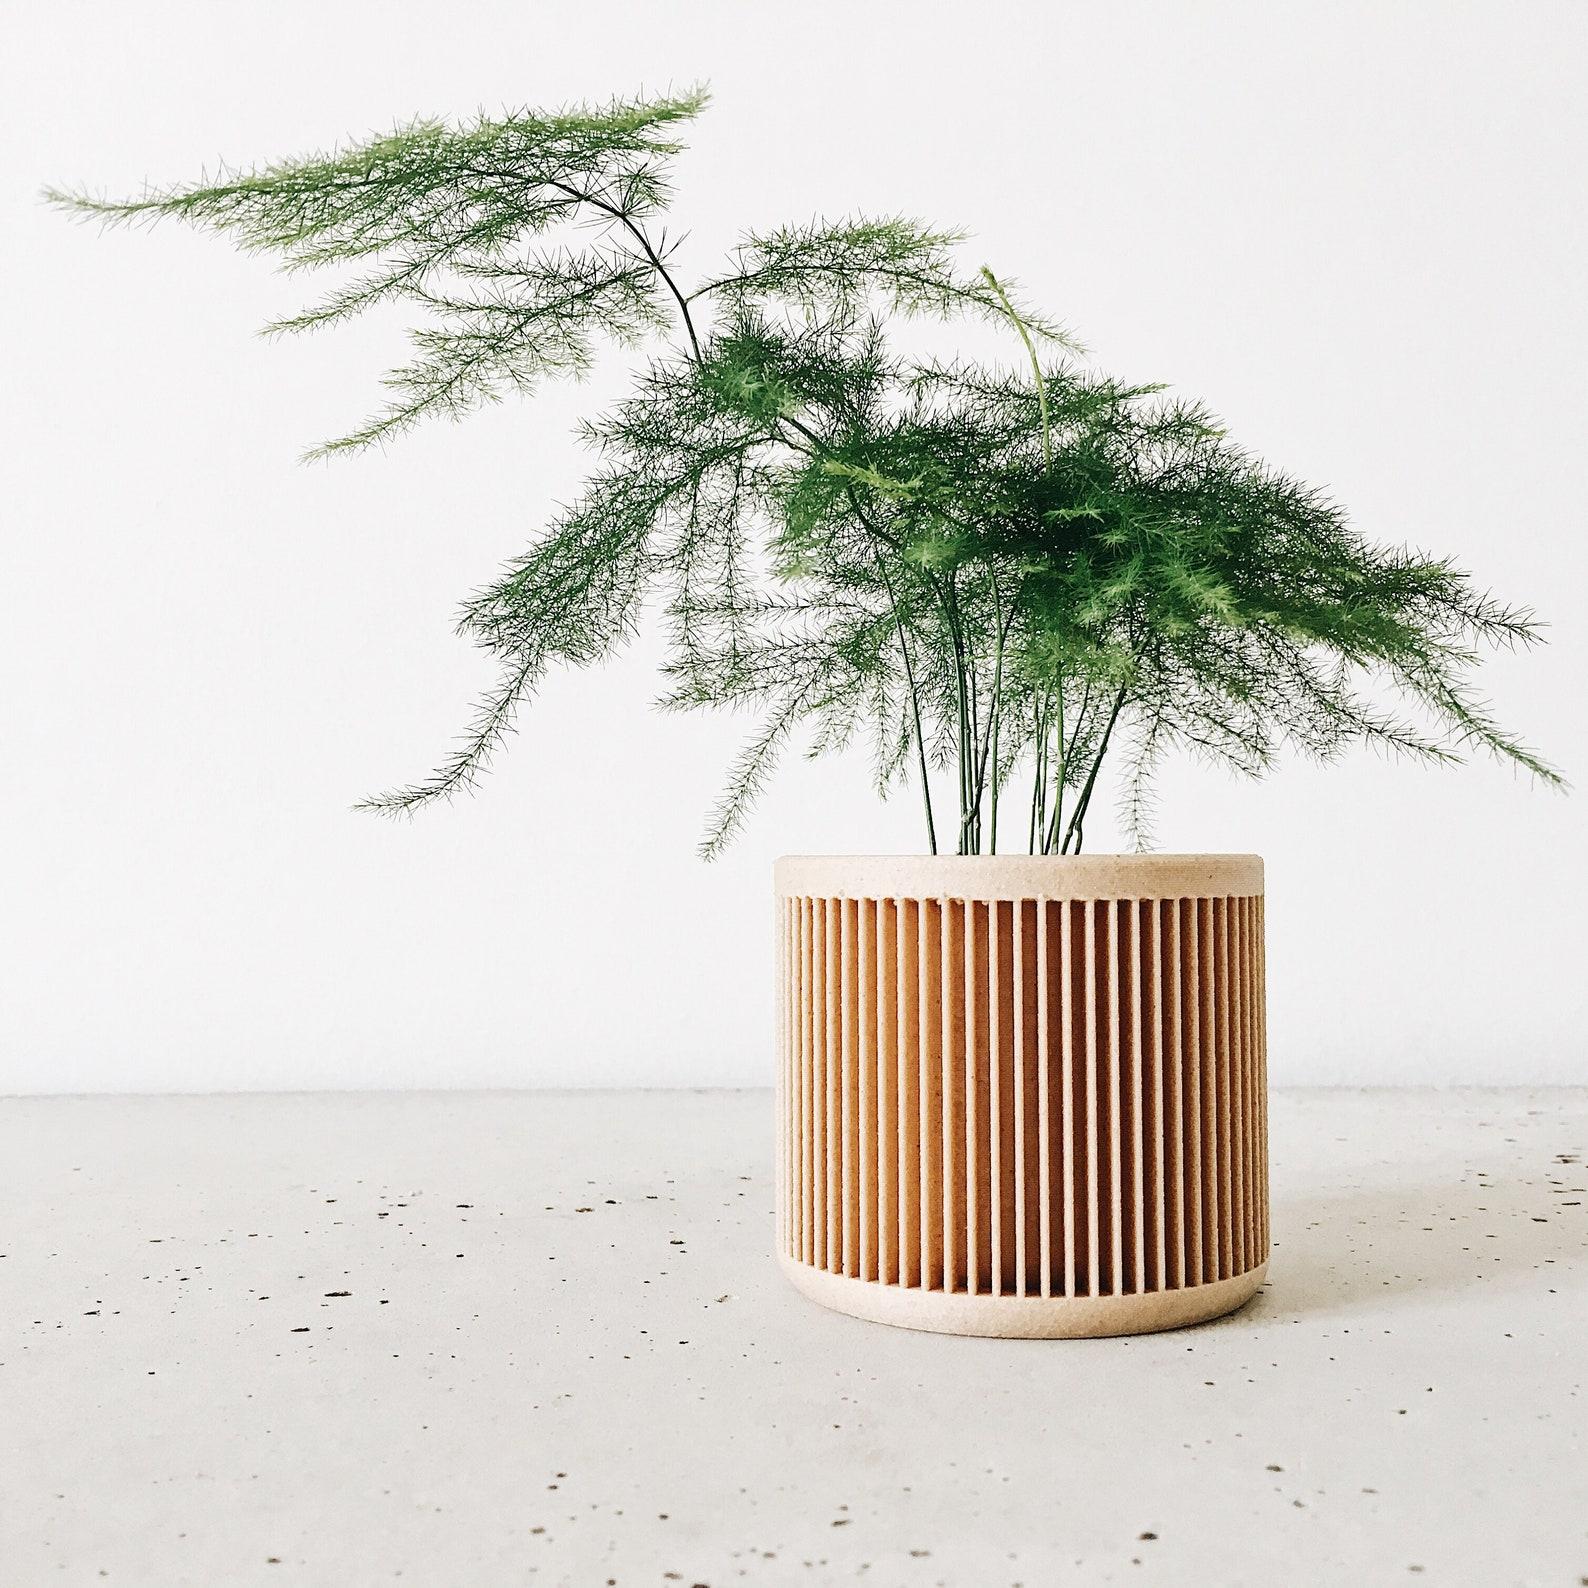 Artisan Geometric Wooden Mid Century Modern Planter